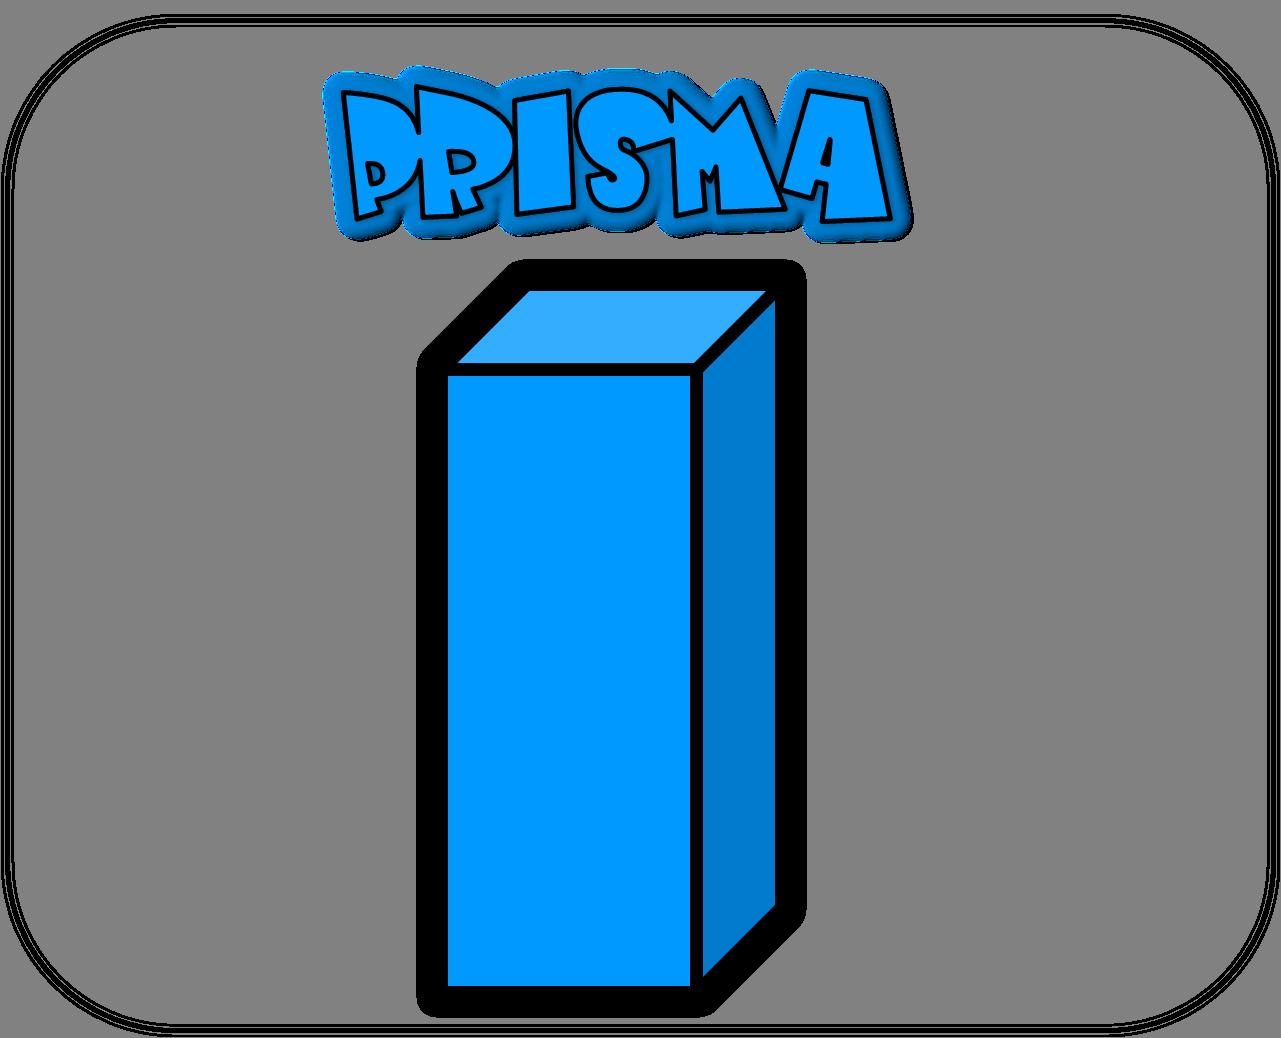 Carteles de las figuras geométricas prisma